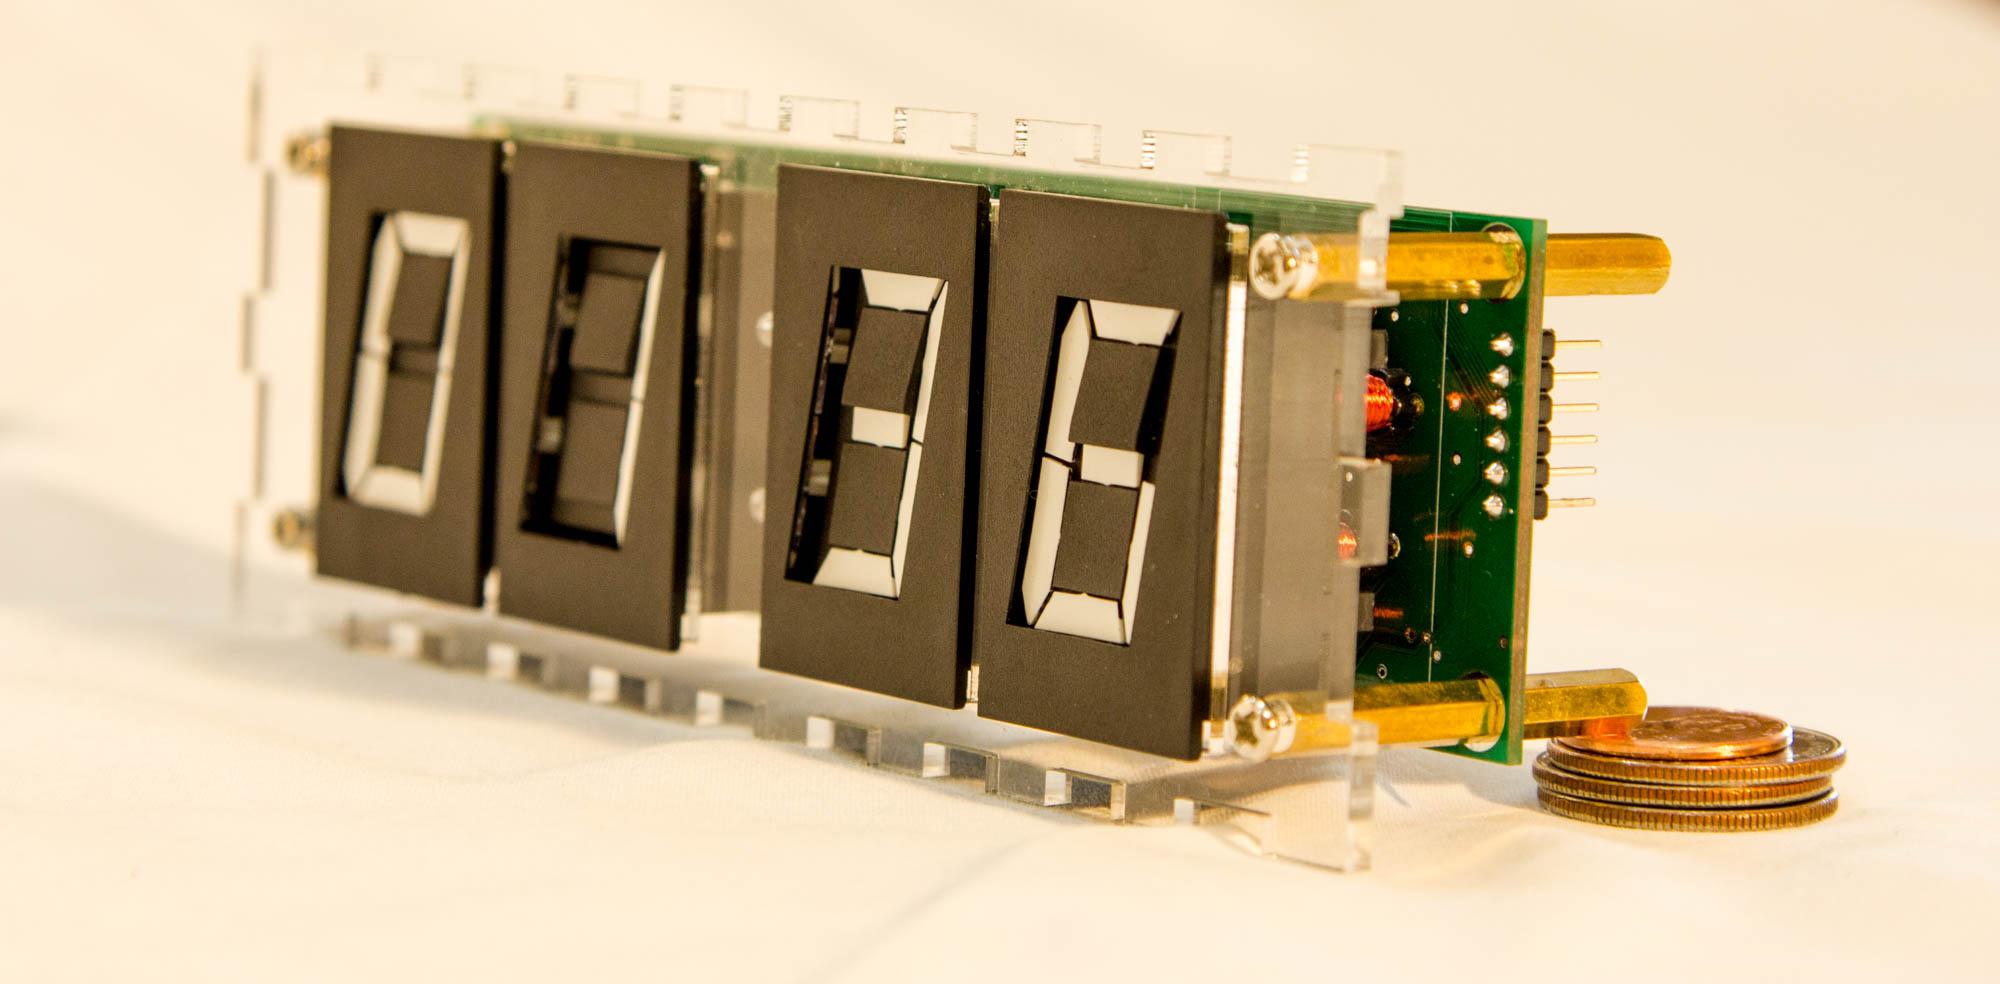 Led Circuit Schematic On Digital Clock Schematics 7 Segment Display